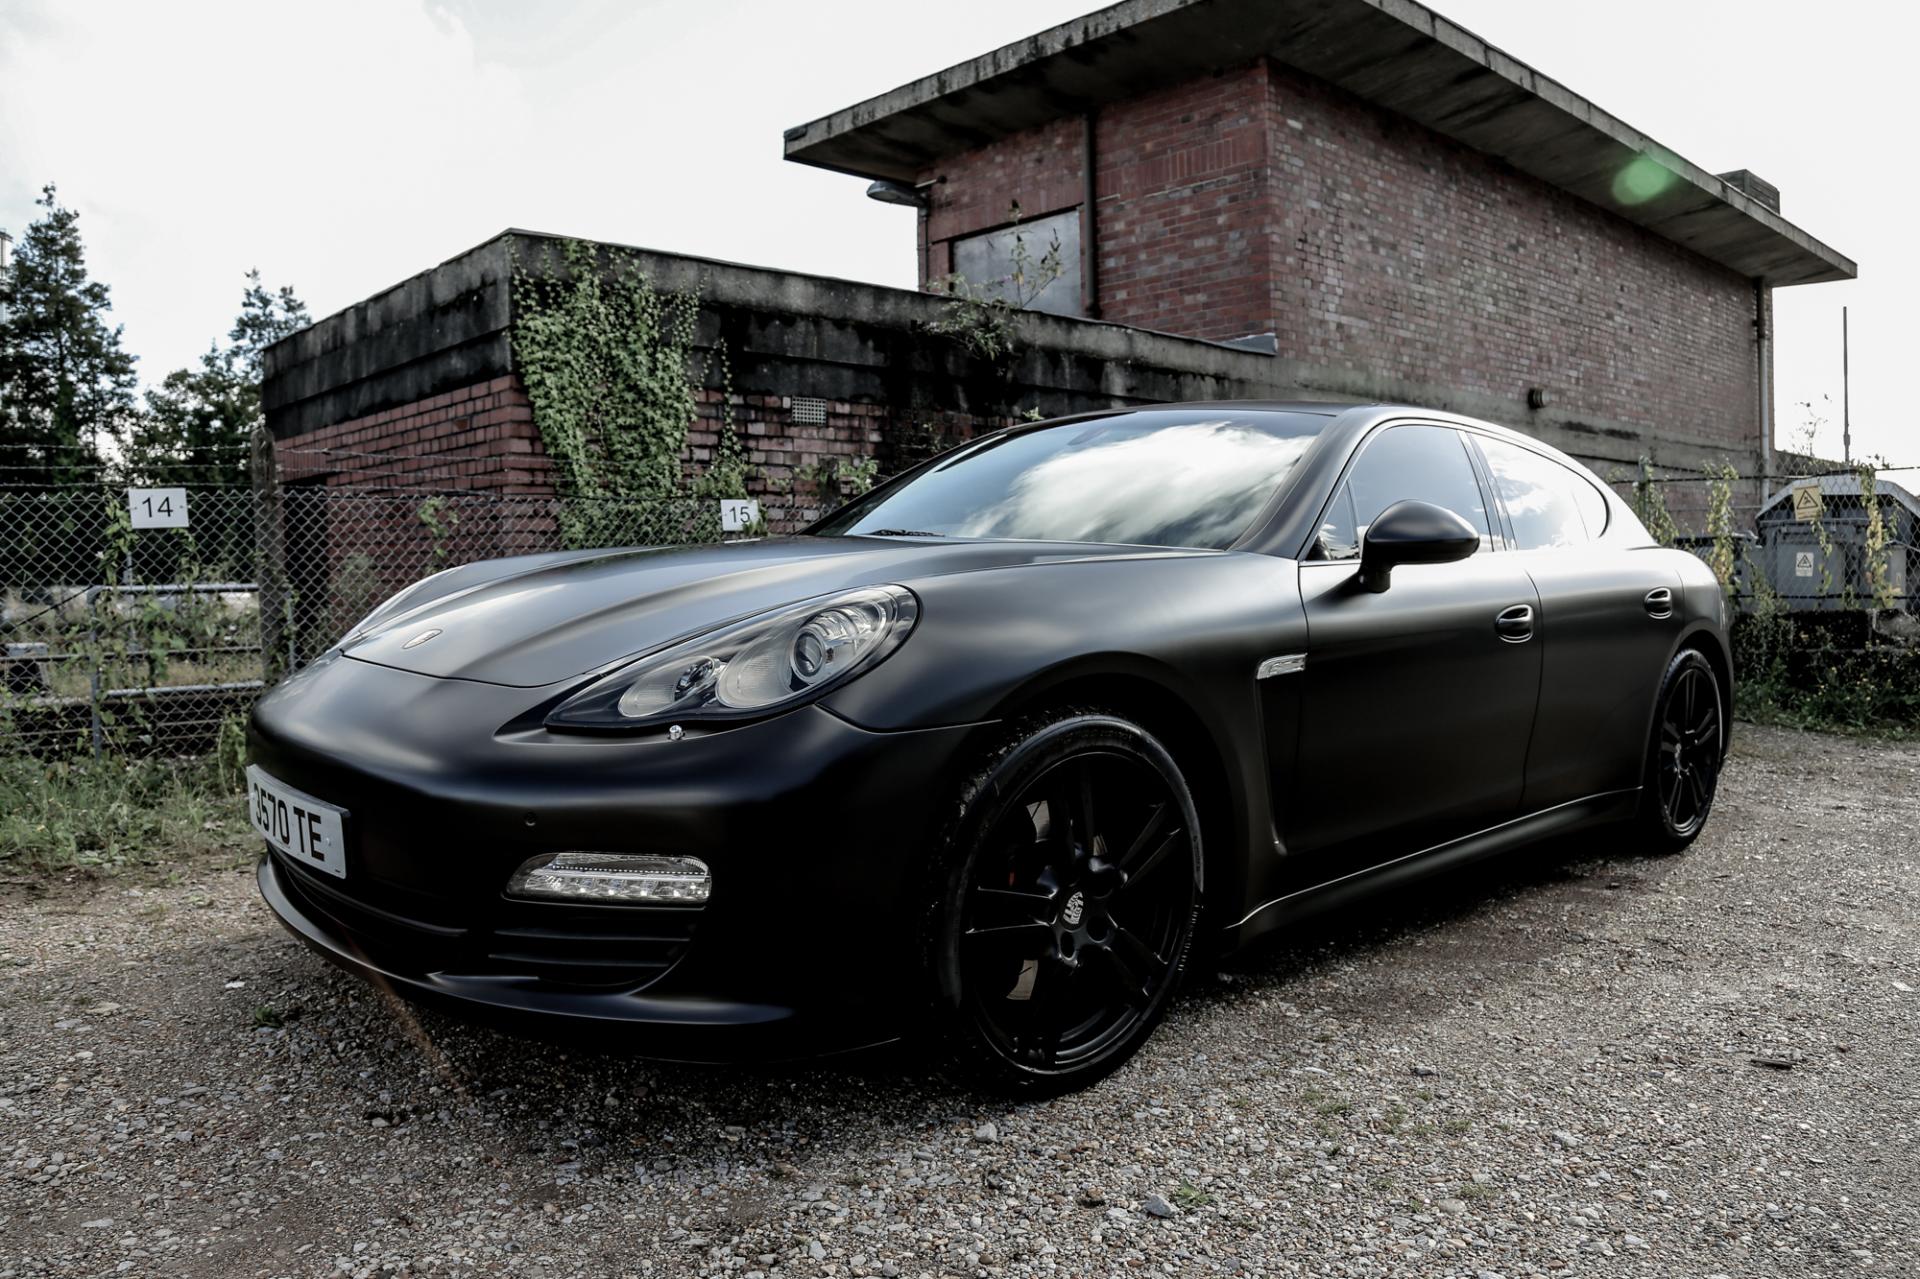 Porsche Panamera Satin Black full wrap